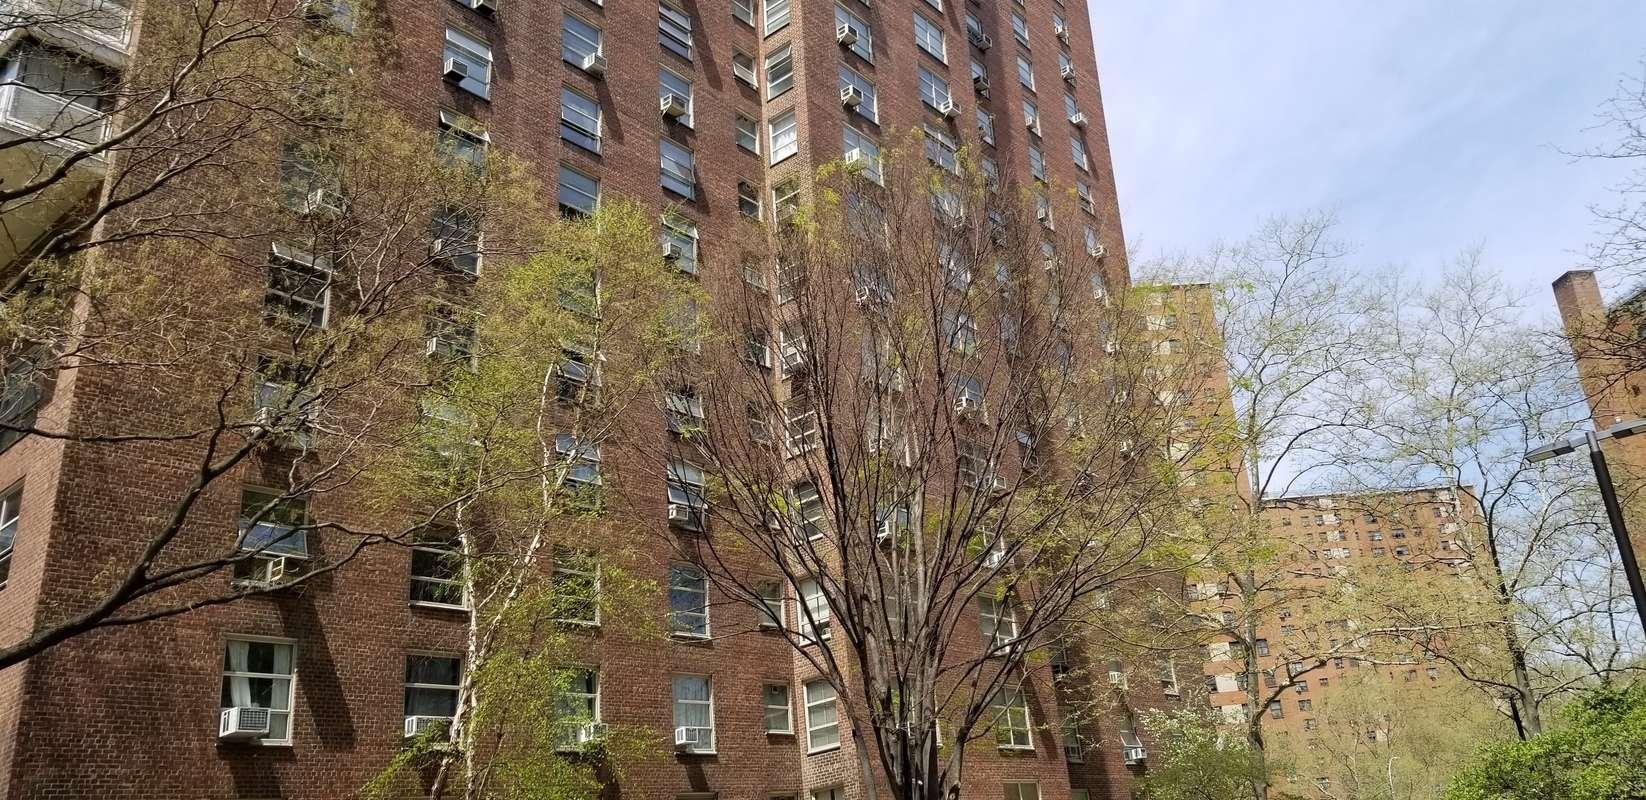 80 LaSalle Street #2E in Morningside Heights, Manhattan | StreetEasy